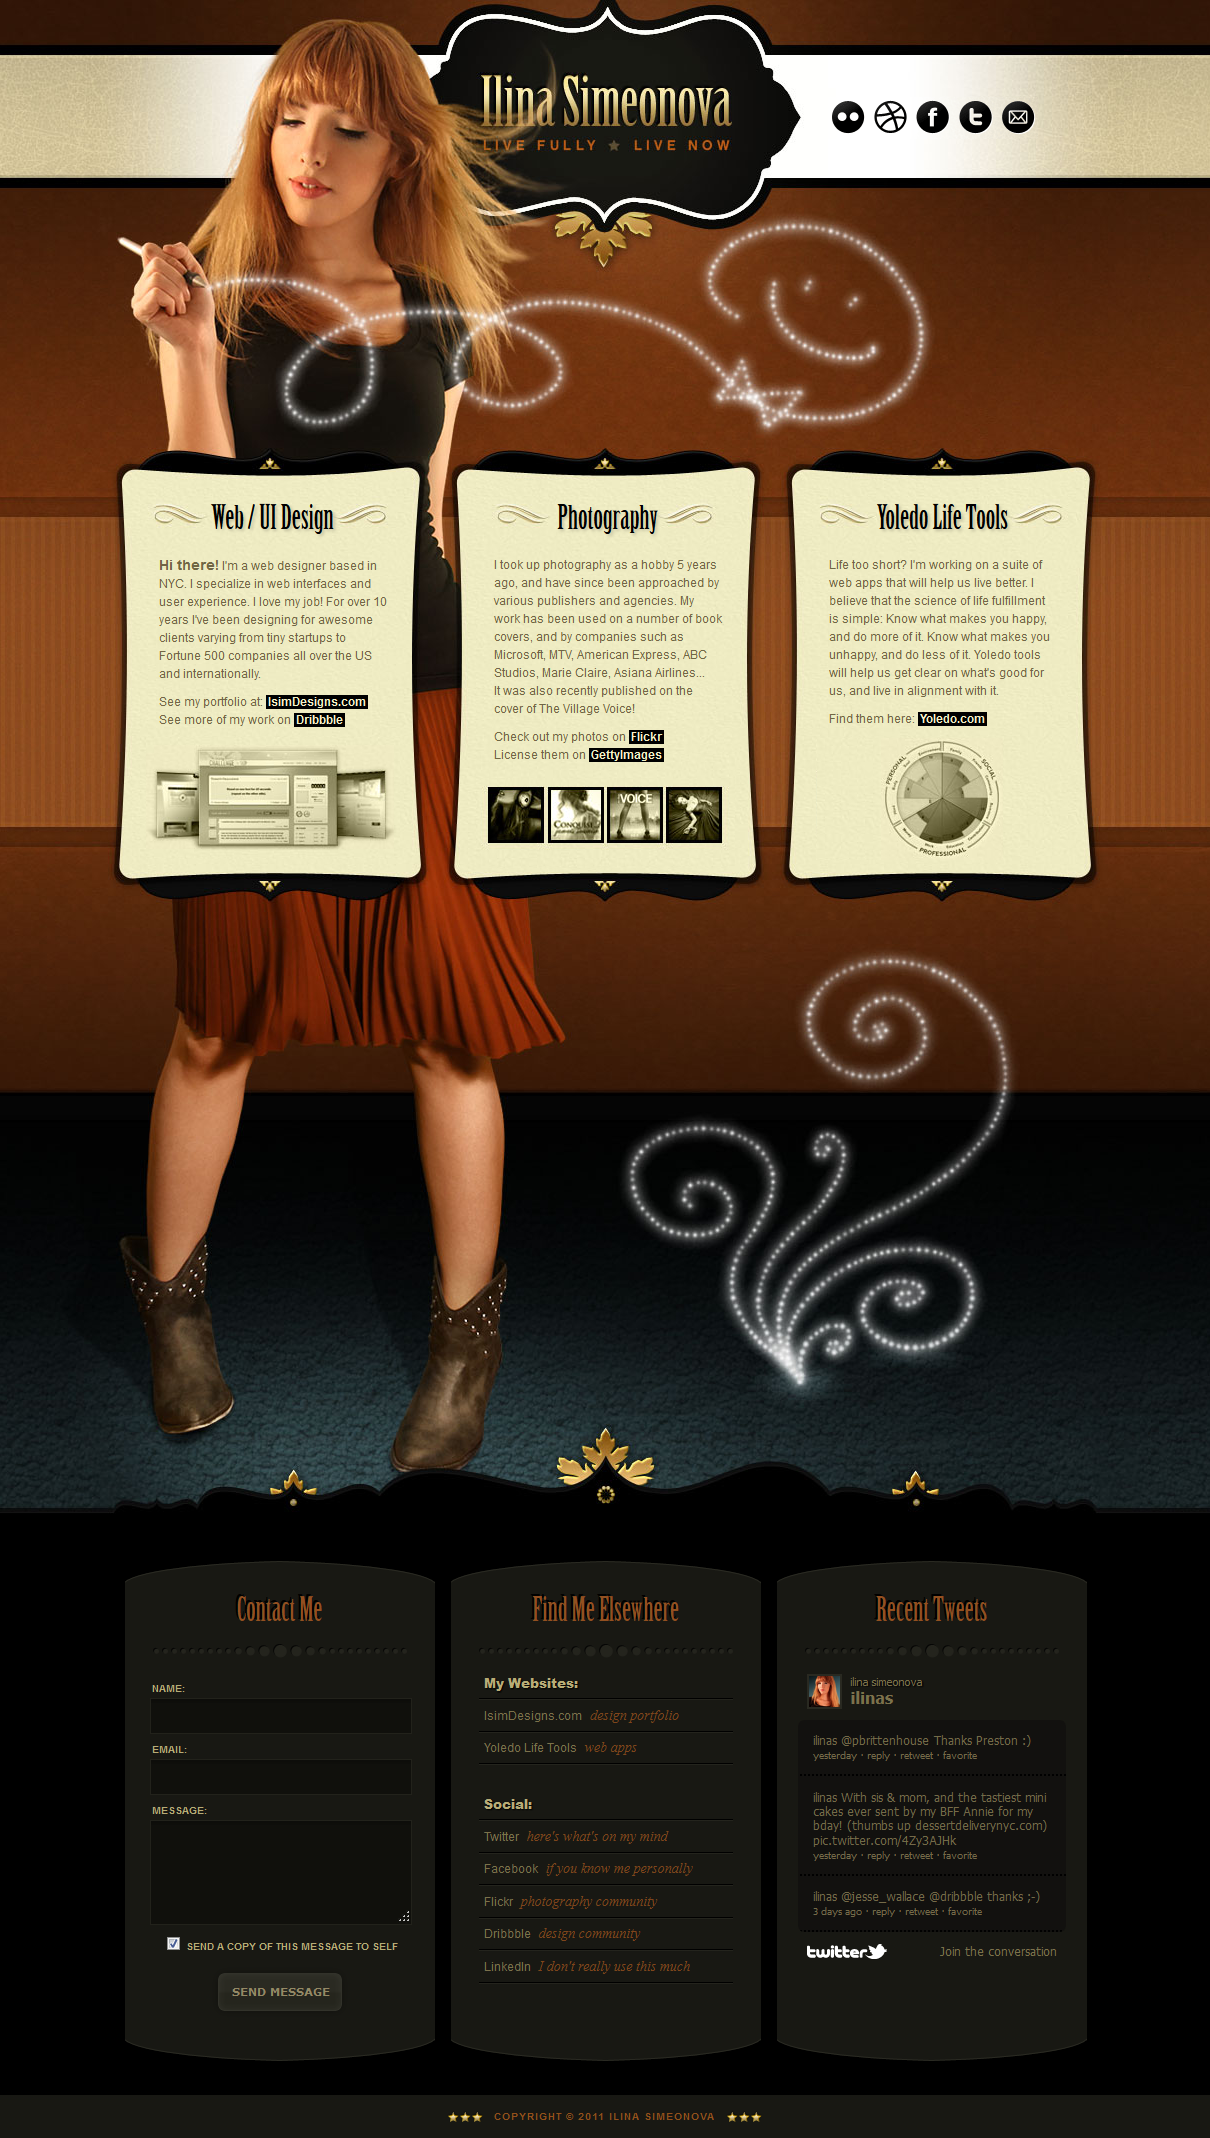 Ilina S. Website Screenshot